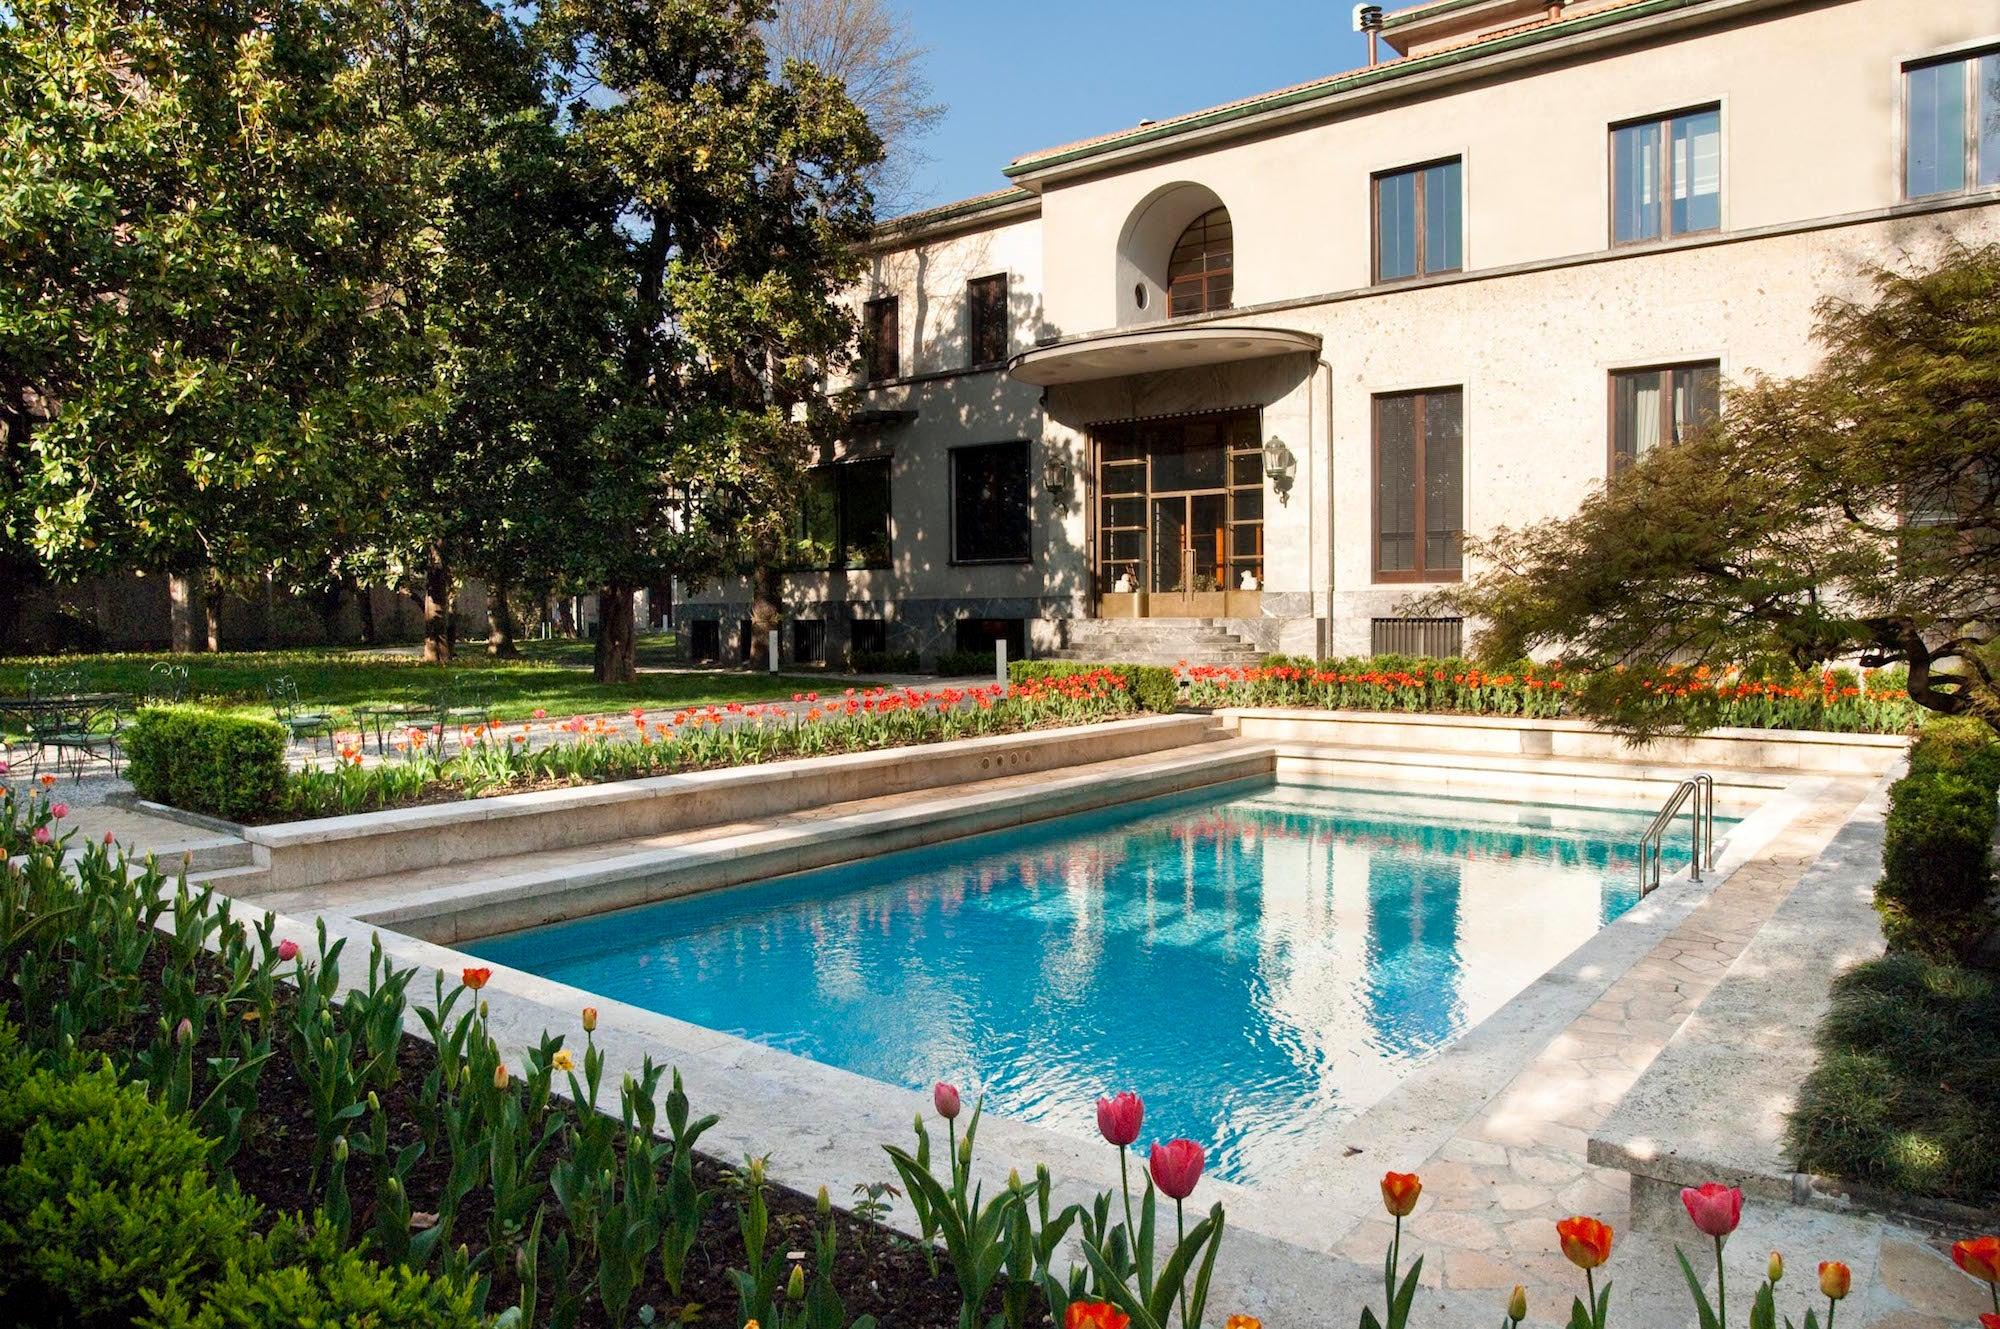 Villa Necchi Campiglio exterior